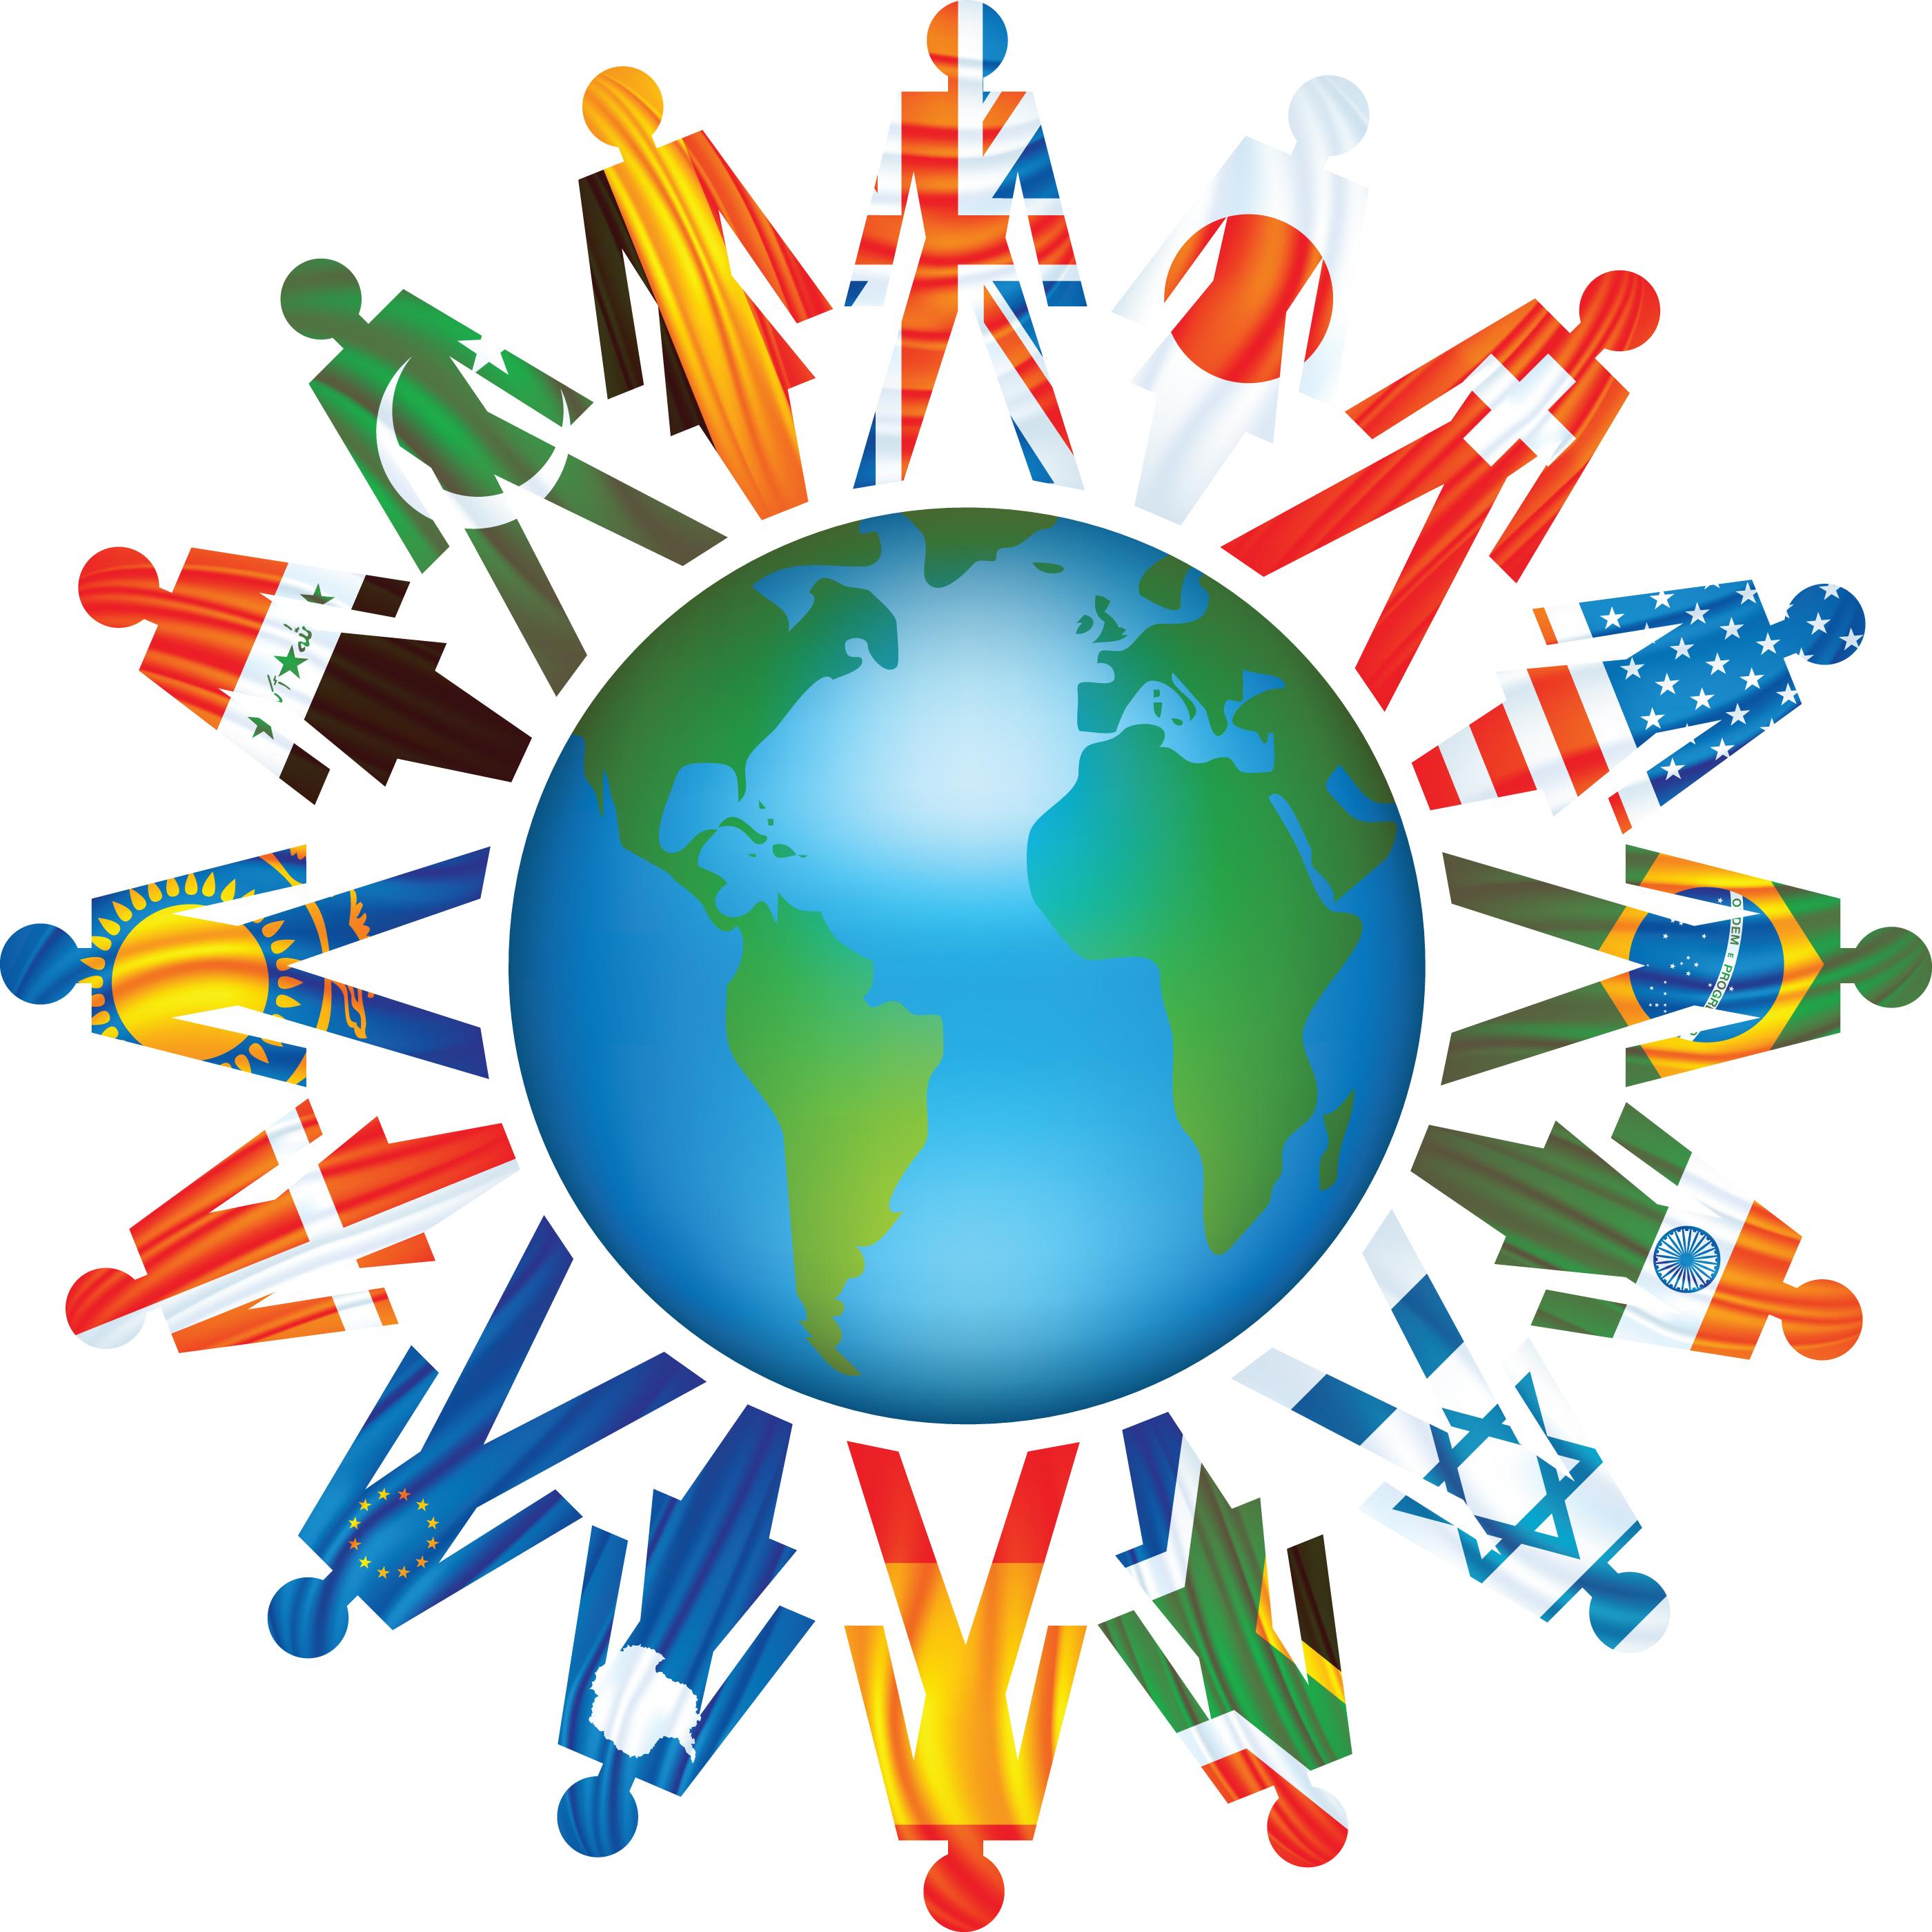 Culture clipart world culture #4